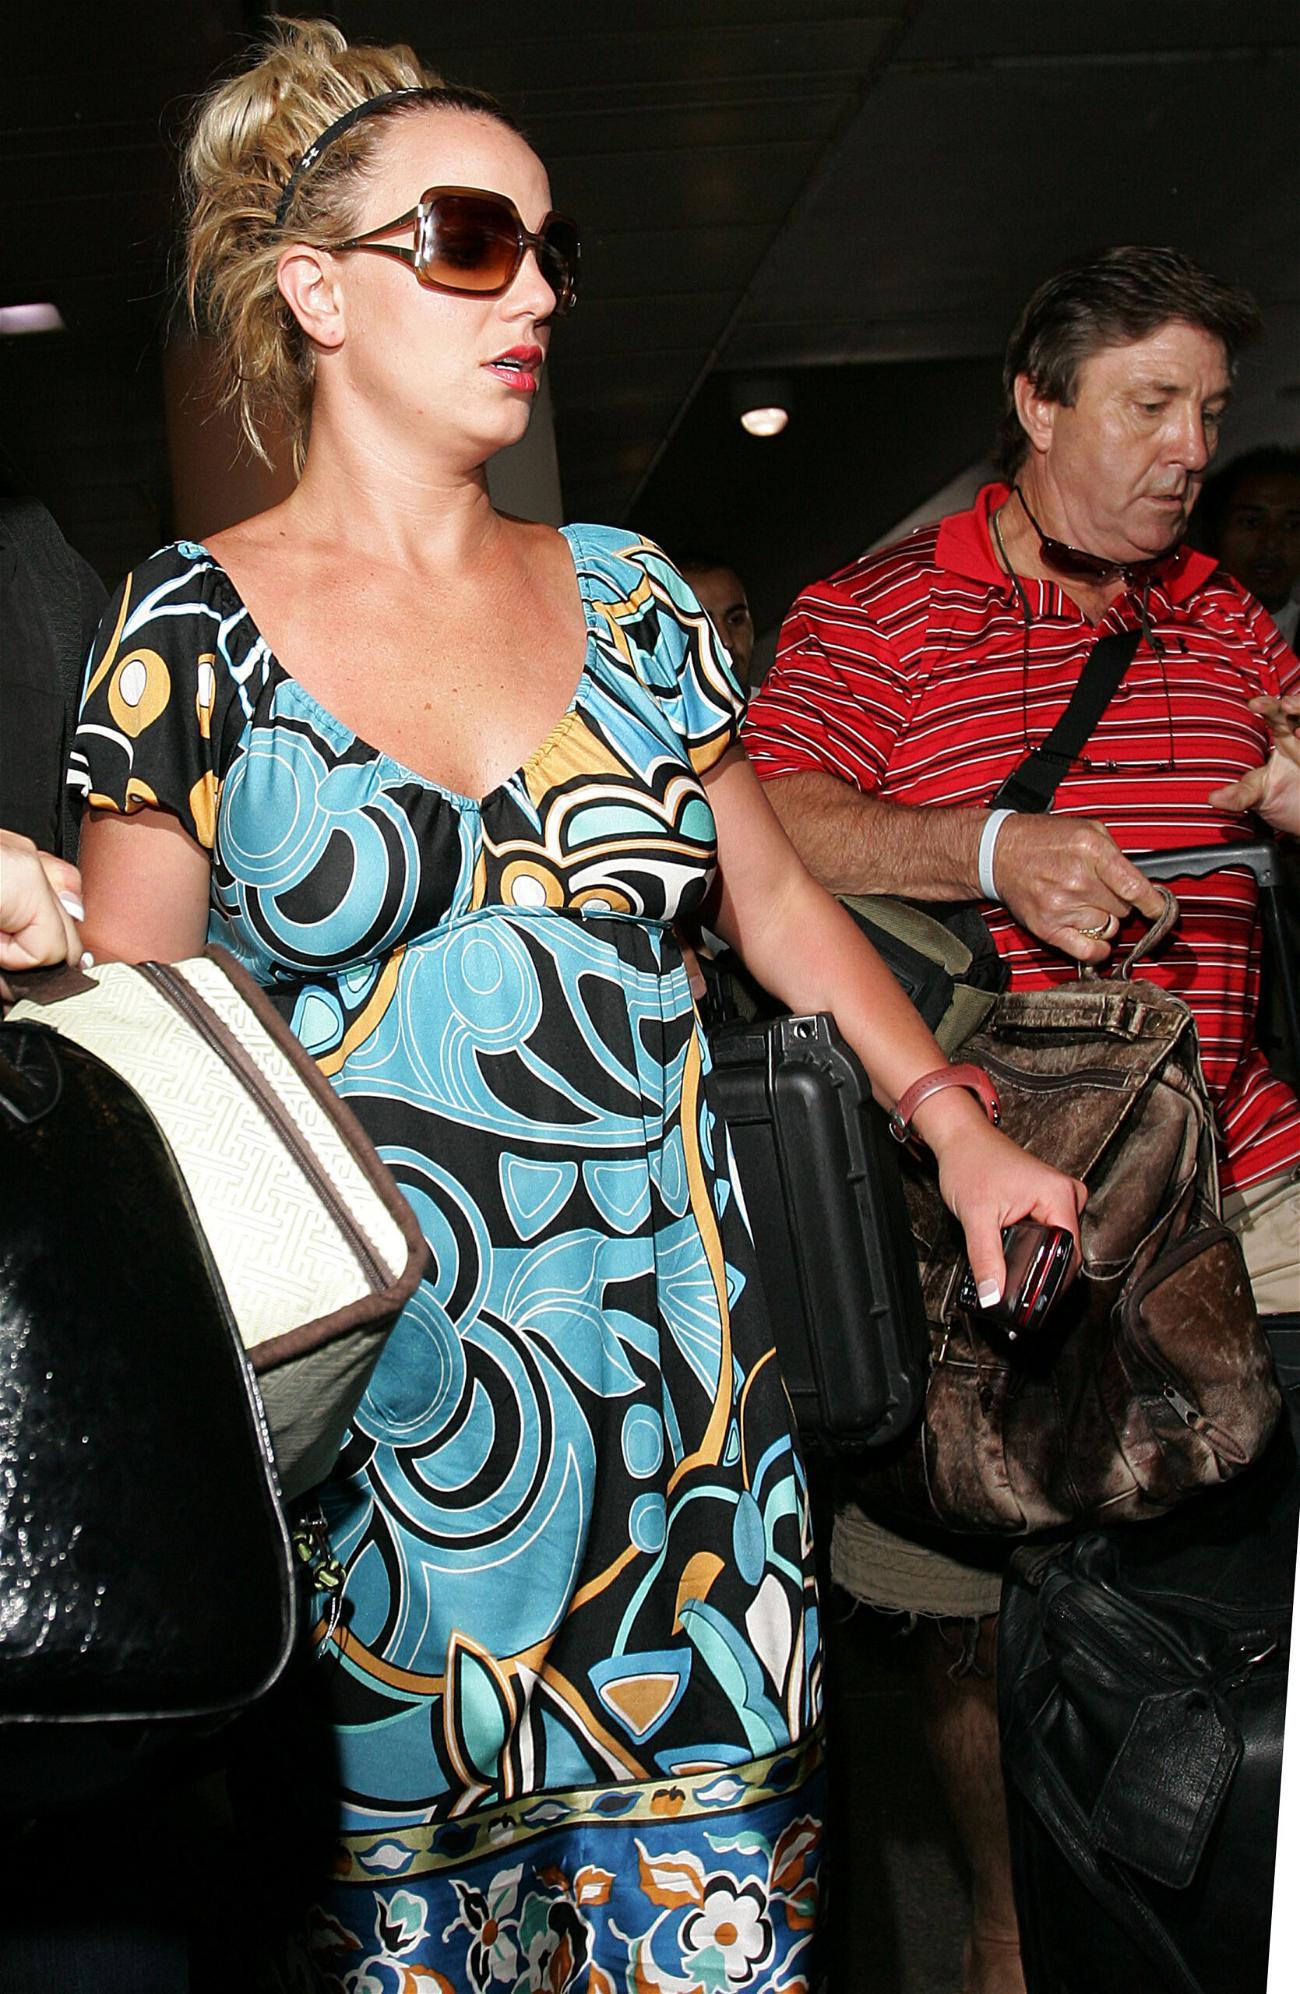 Britney Spears' Father Slammed Over Conservatorship